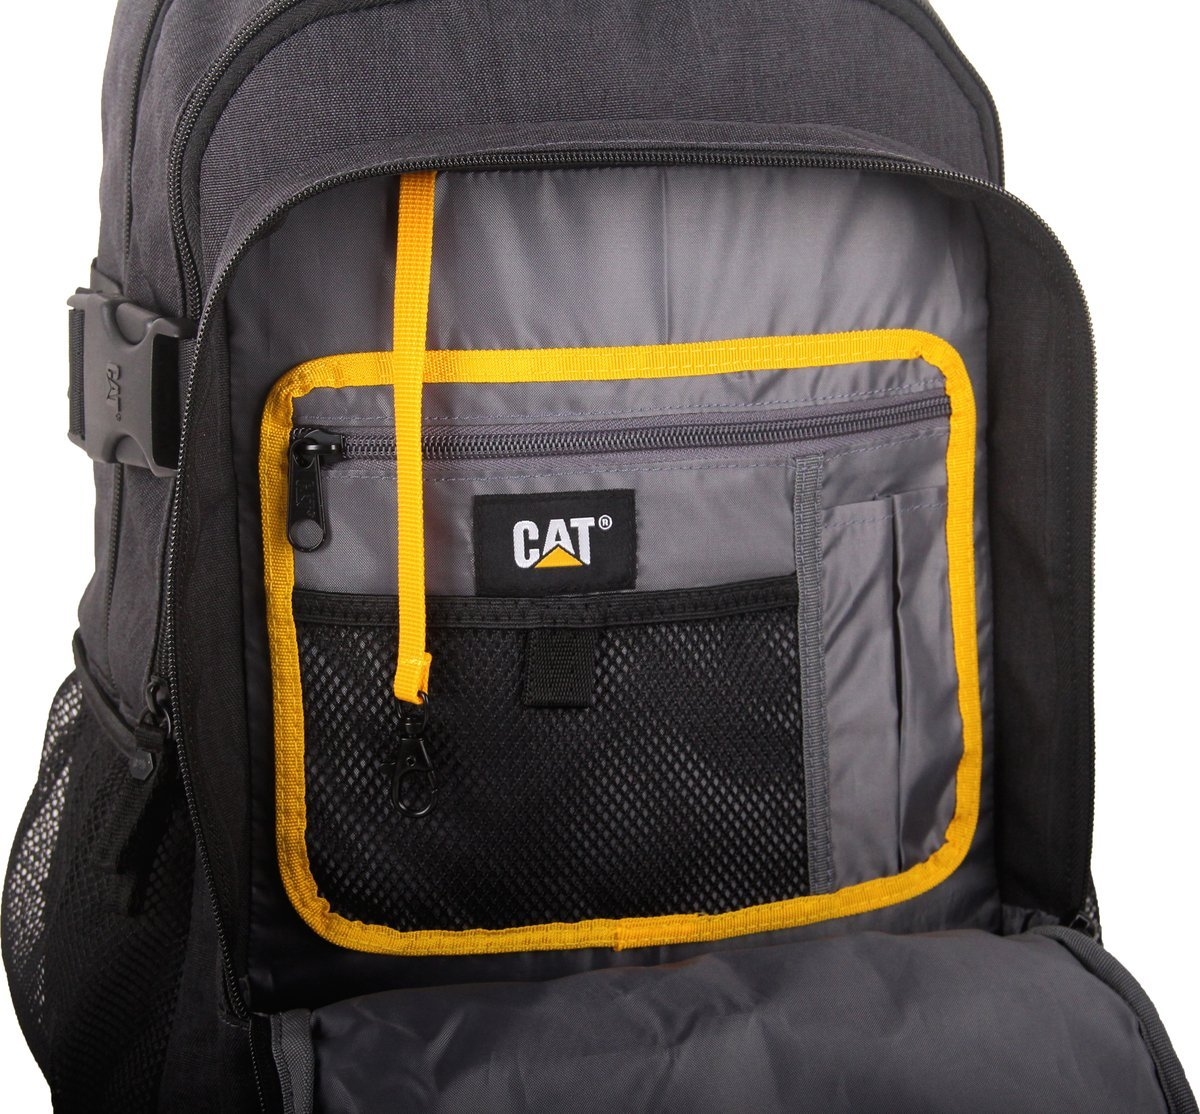 "Plecak Kenneth na laptopa do 15,6"" CAT Caterpillar szary"